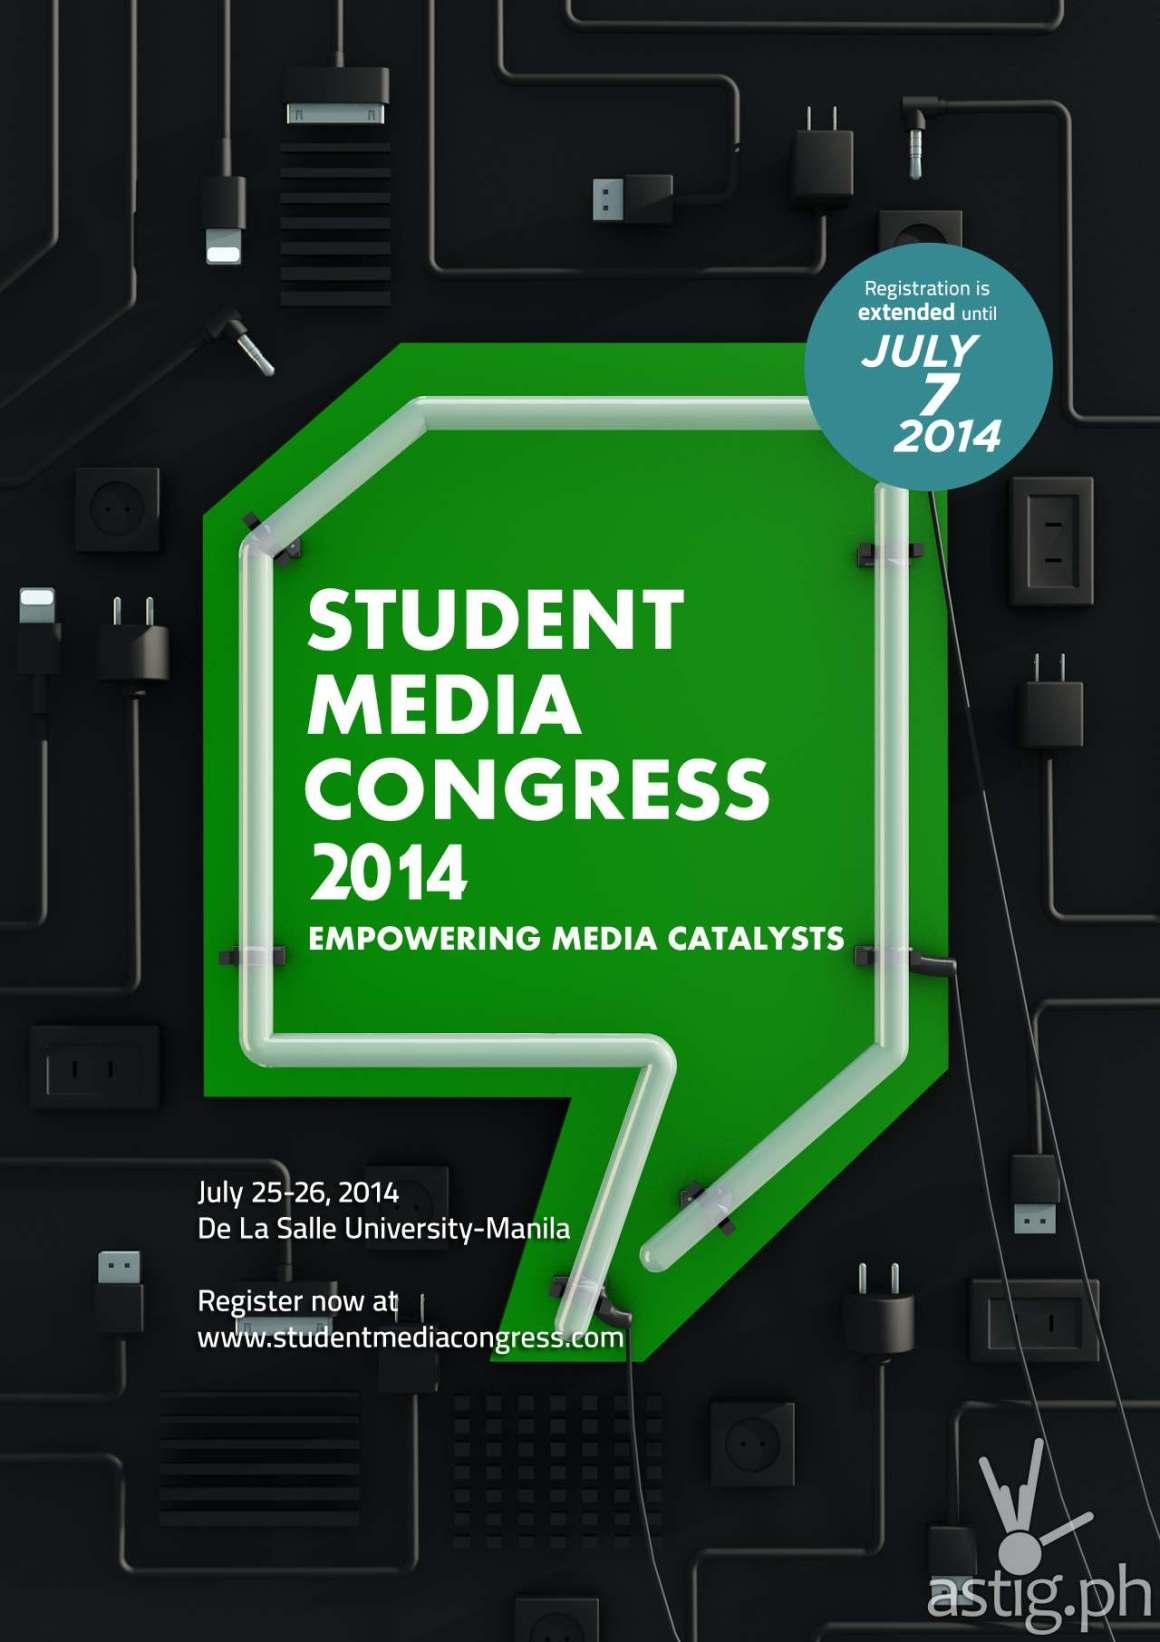 Student Media Congress 2014 poster